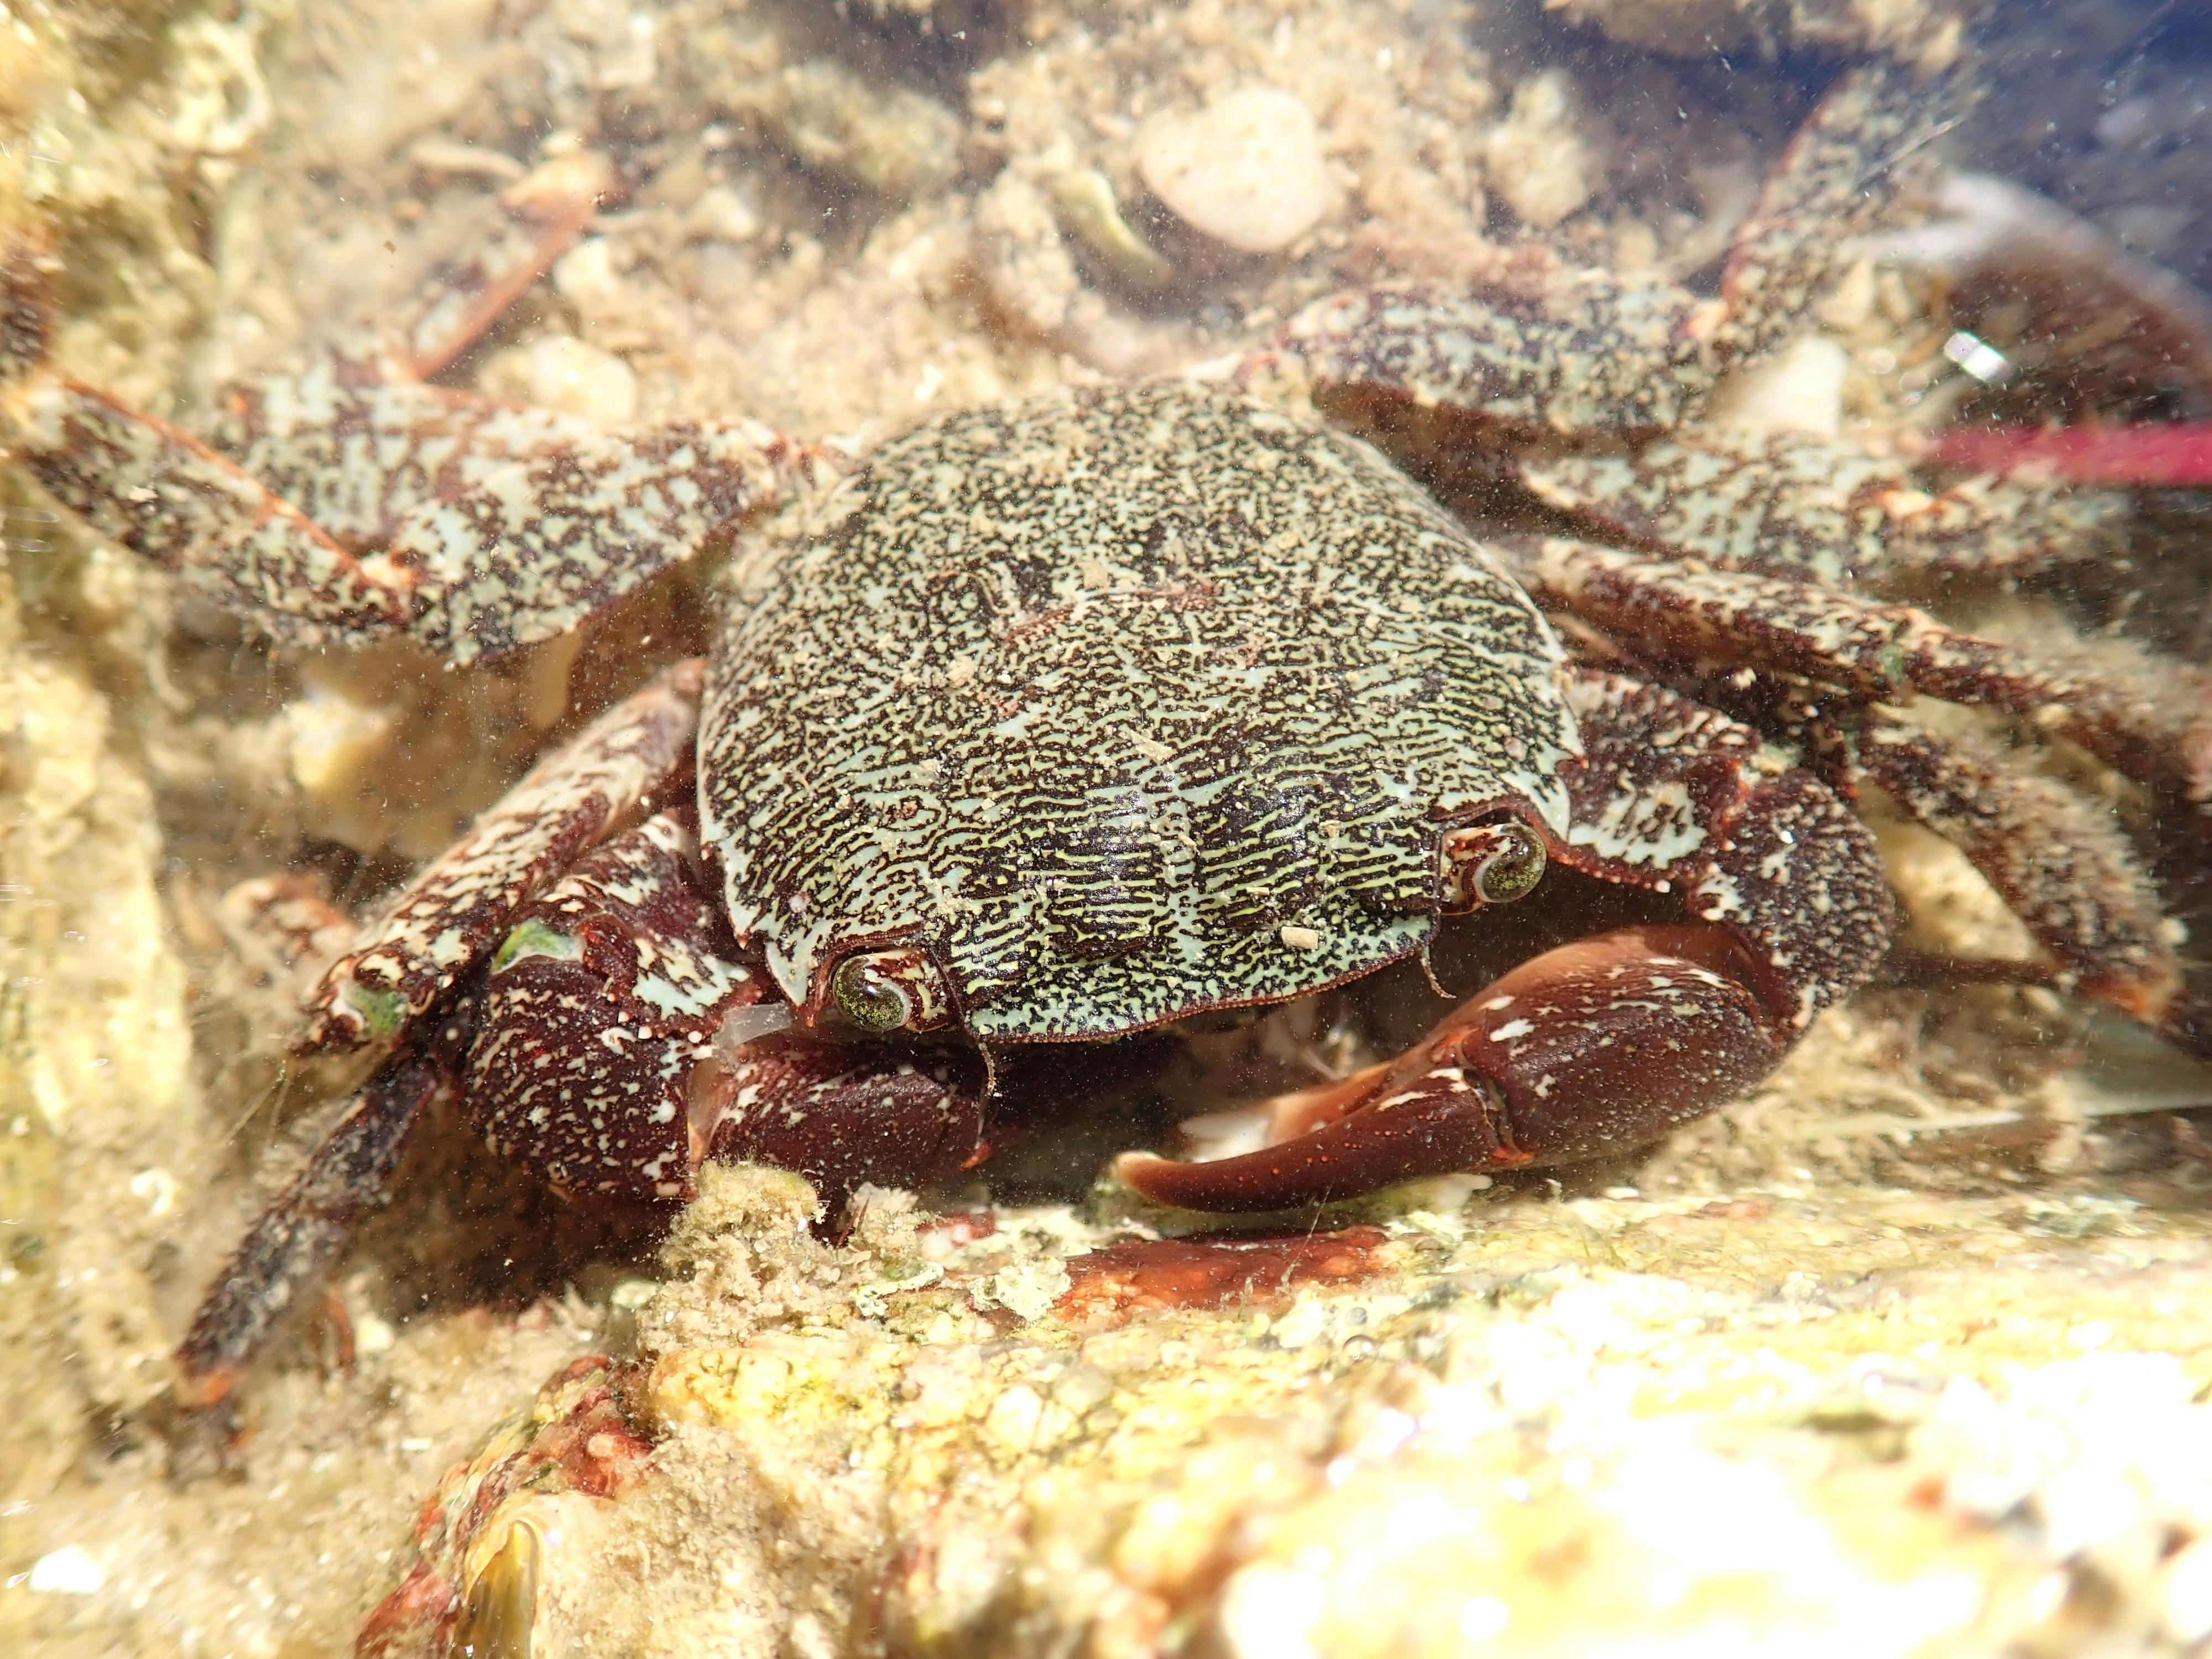 Pachygrapsus marmoratus crab